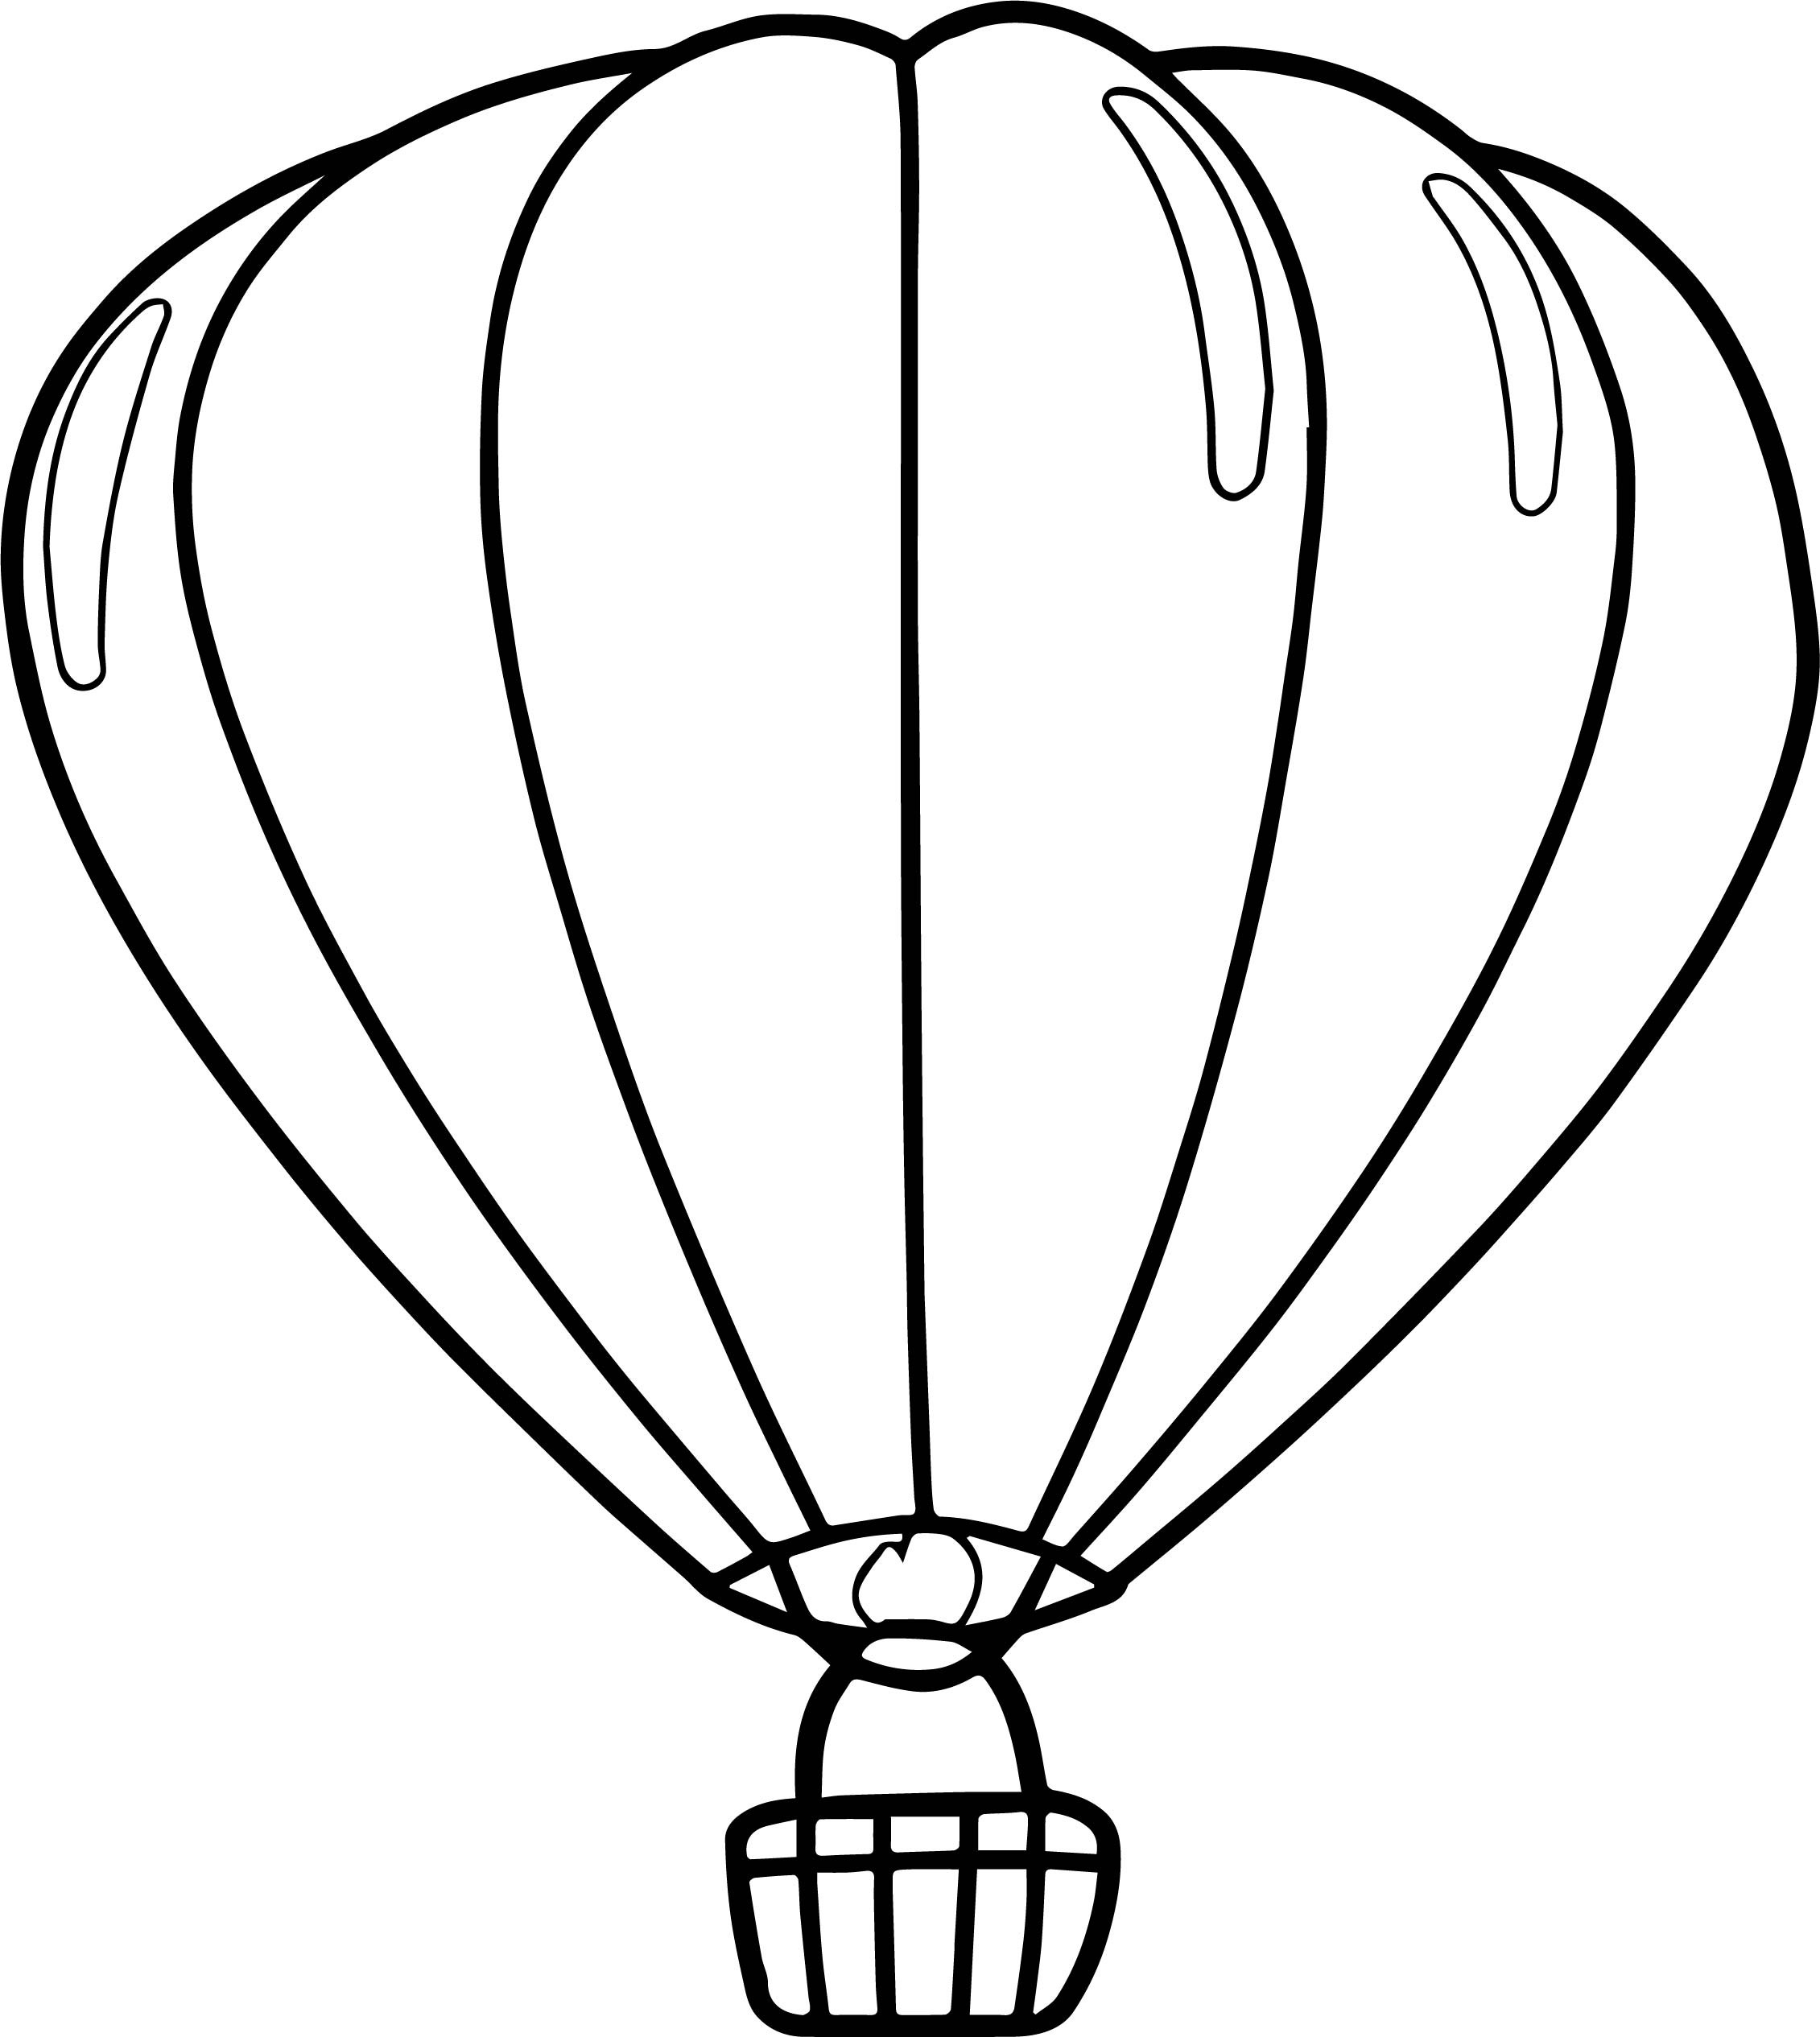 Free Coloring Sheets Of Balloons  Balloon Coloring Pages Coloring Pages Printable Free